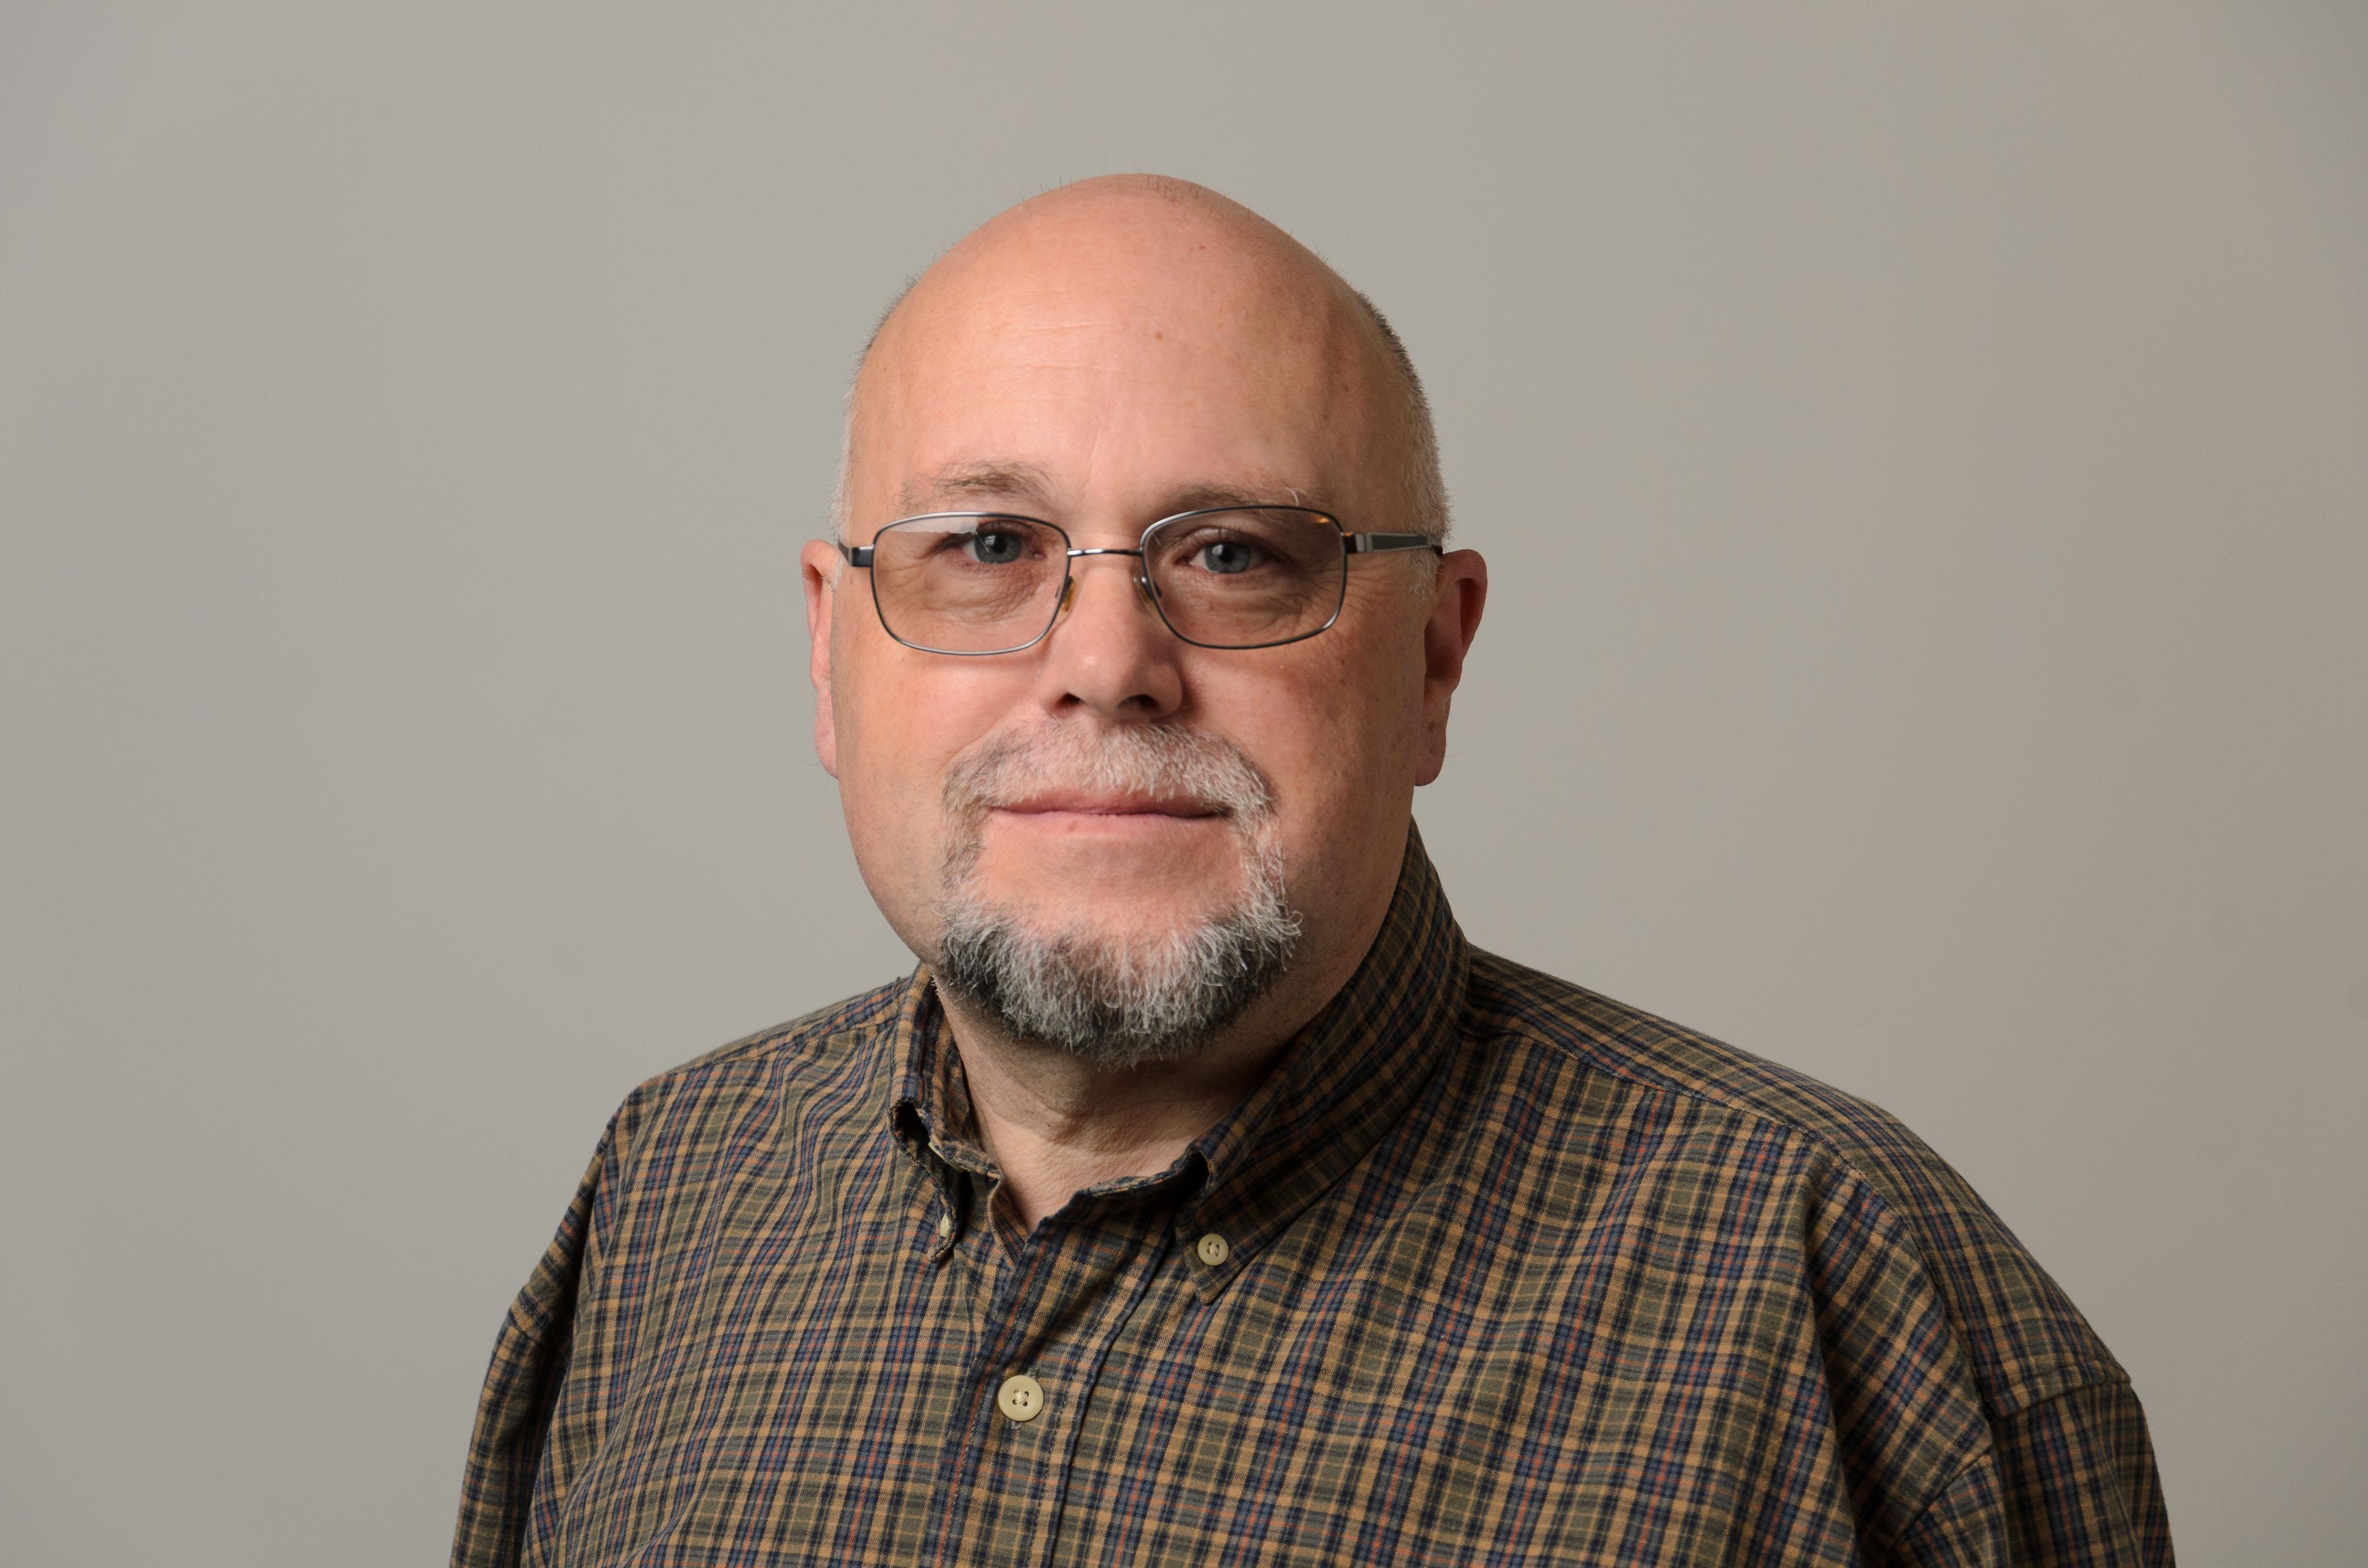 Headshot of David Judd. Plaid Shirt, Glasses.